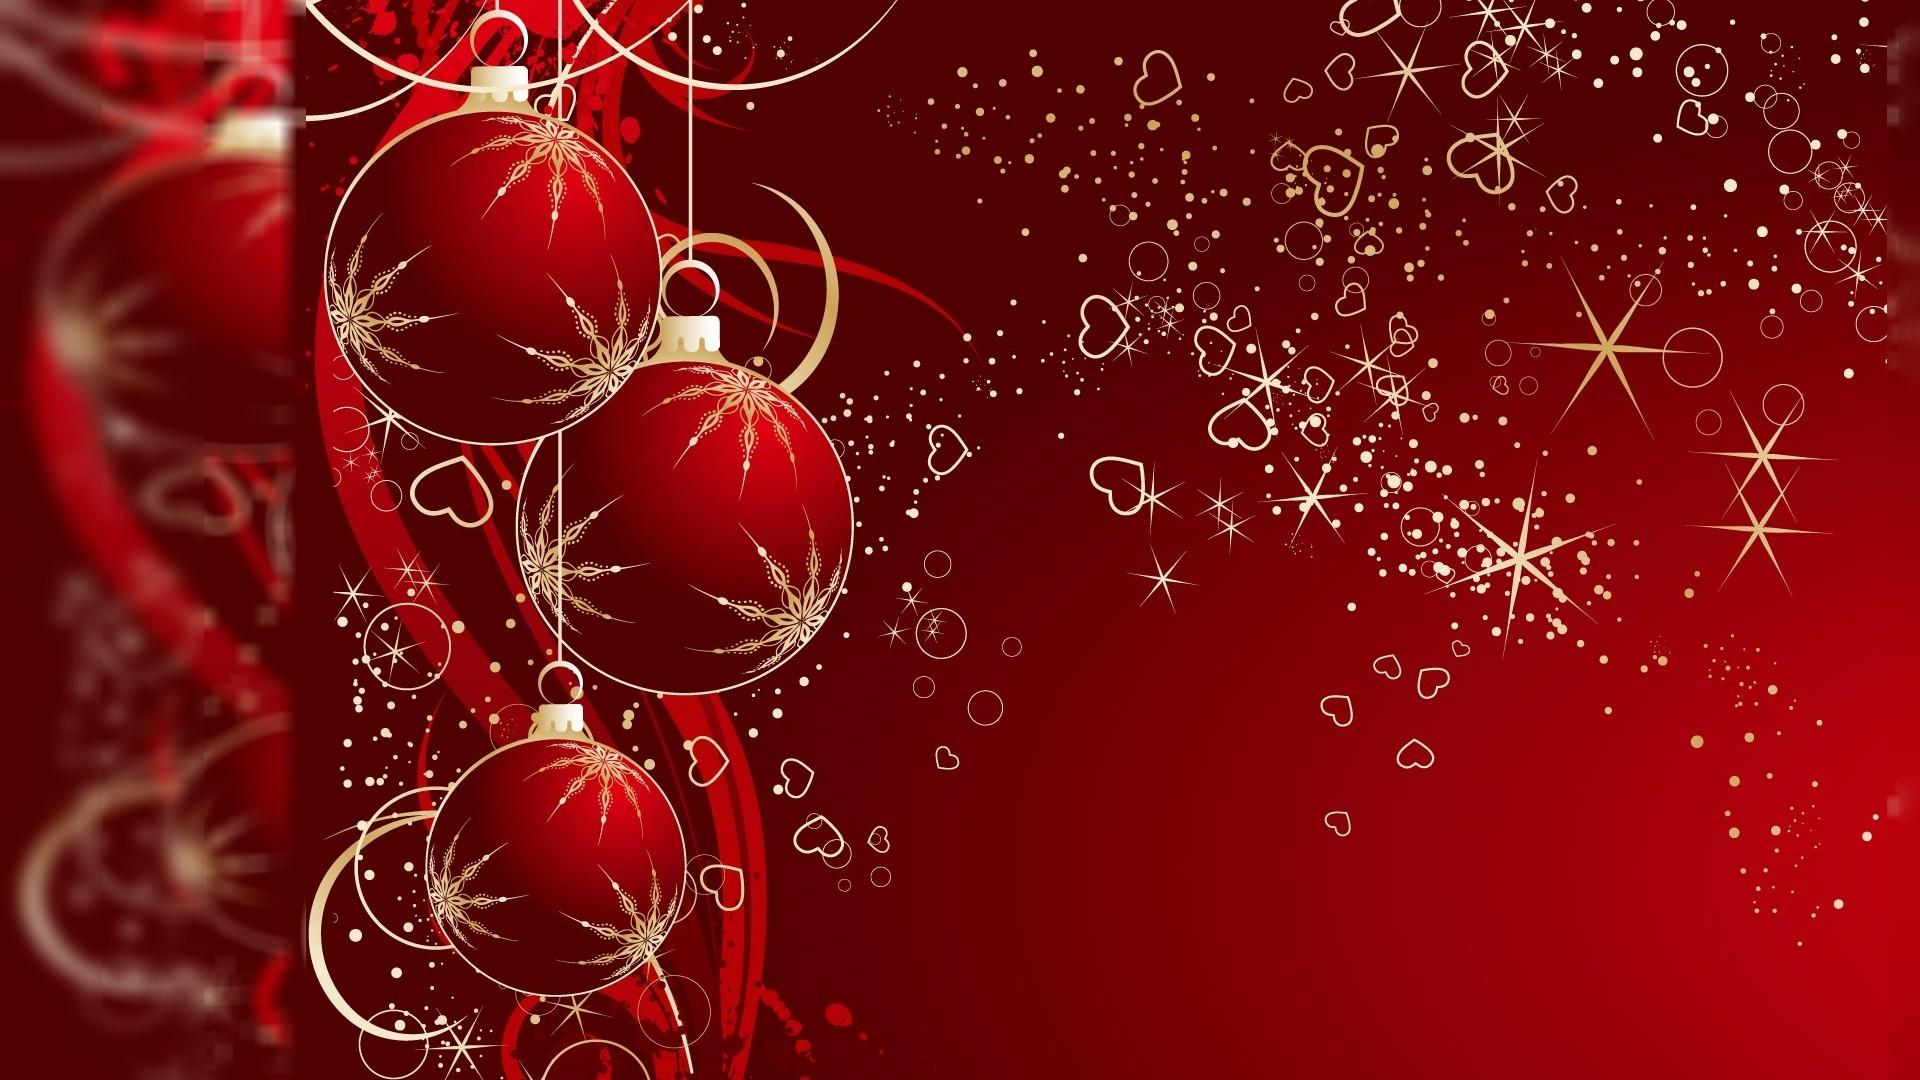 Christmas Desktop Backgrounds | Free Christmas Desktop Backgrounds for .